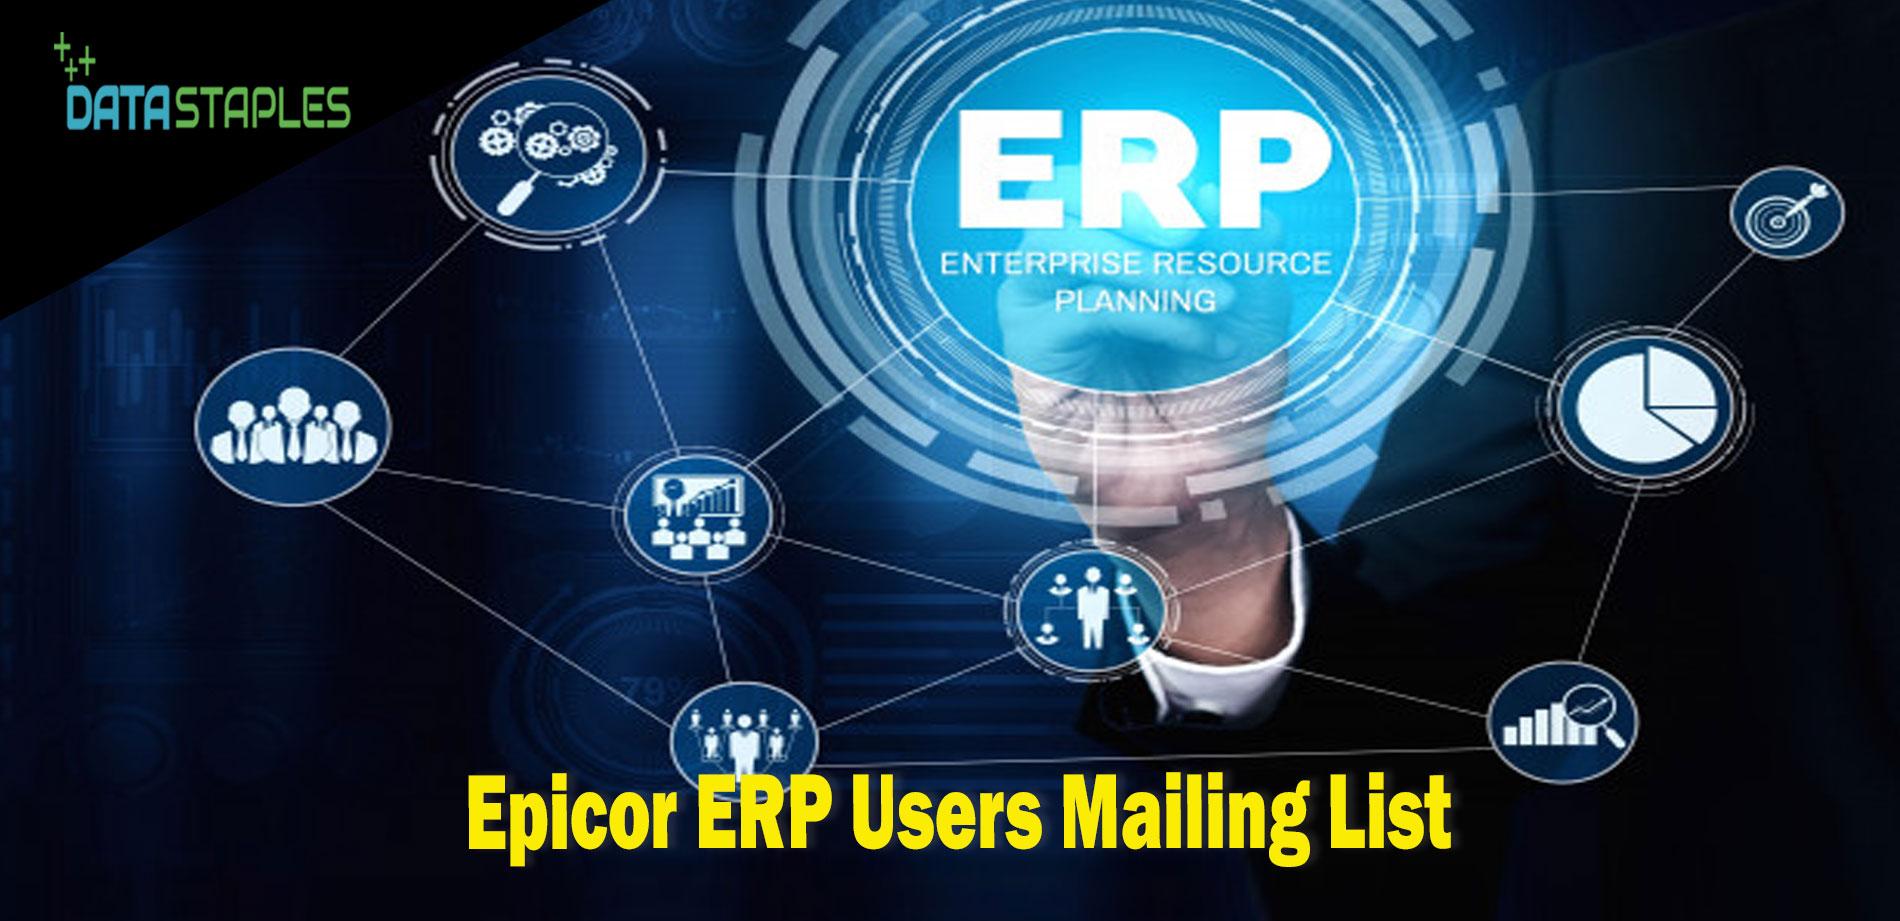 Epicor ERP Users Email List | DataStaples